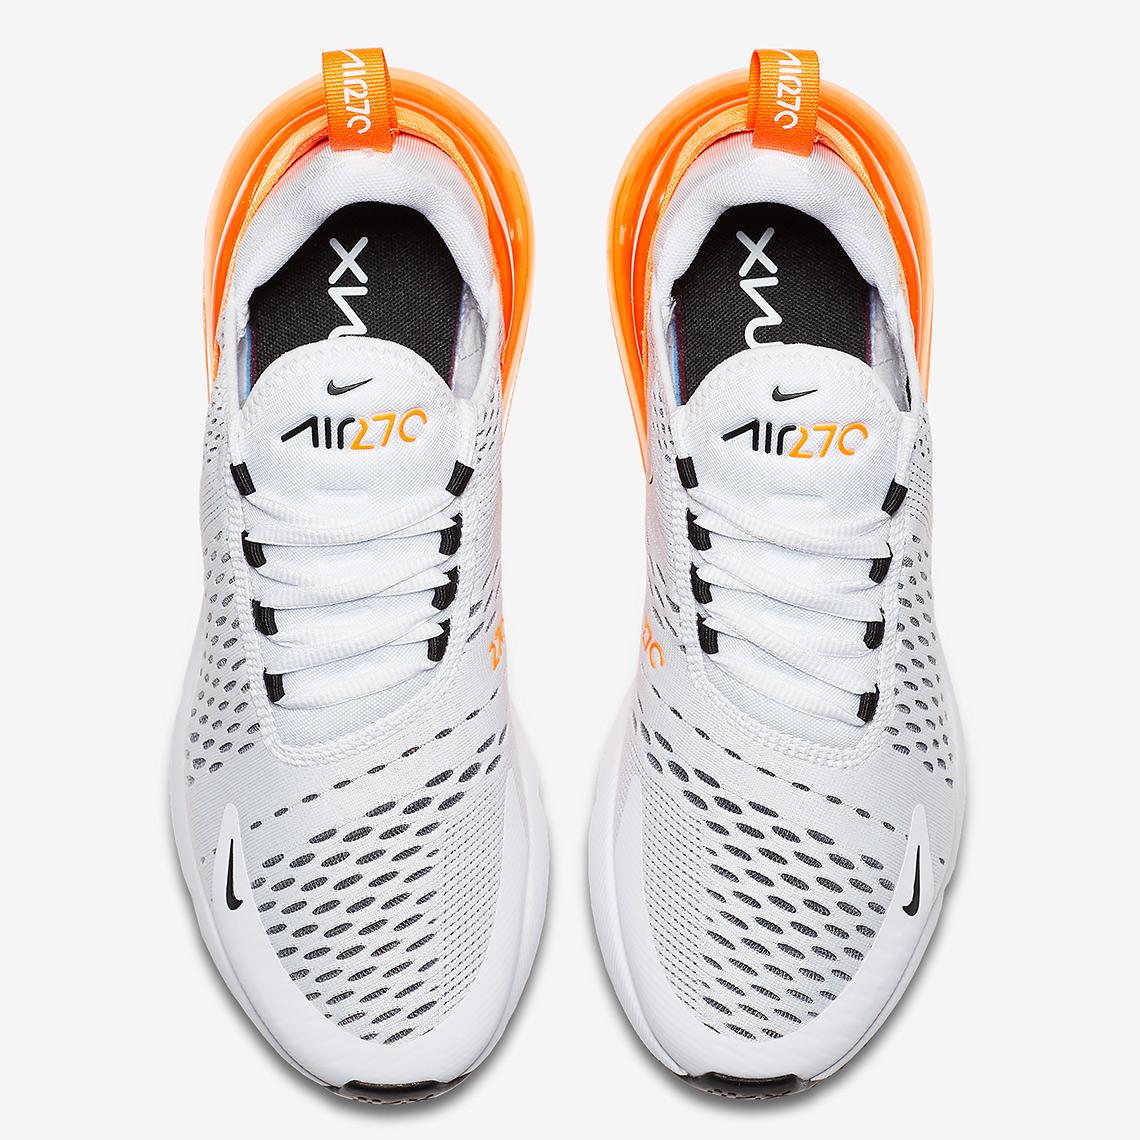 28b5940ea34e Nike Air Max 270  150. Color  White Orange-Black Style Code  AH6789-104